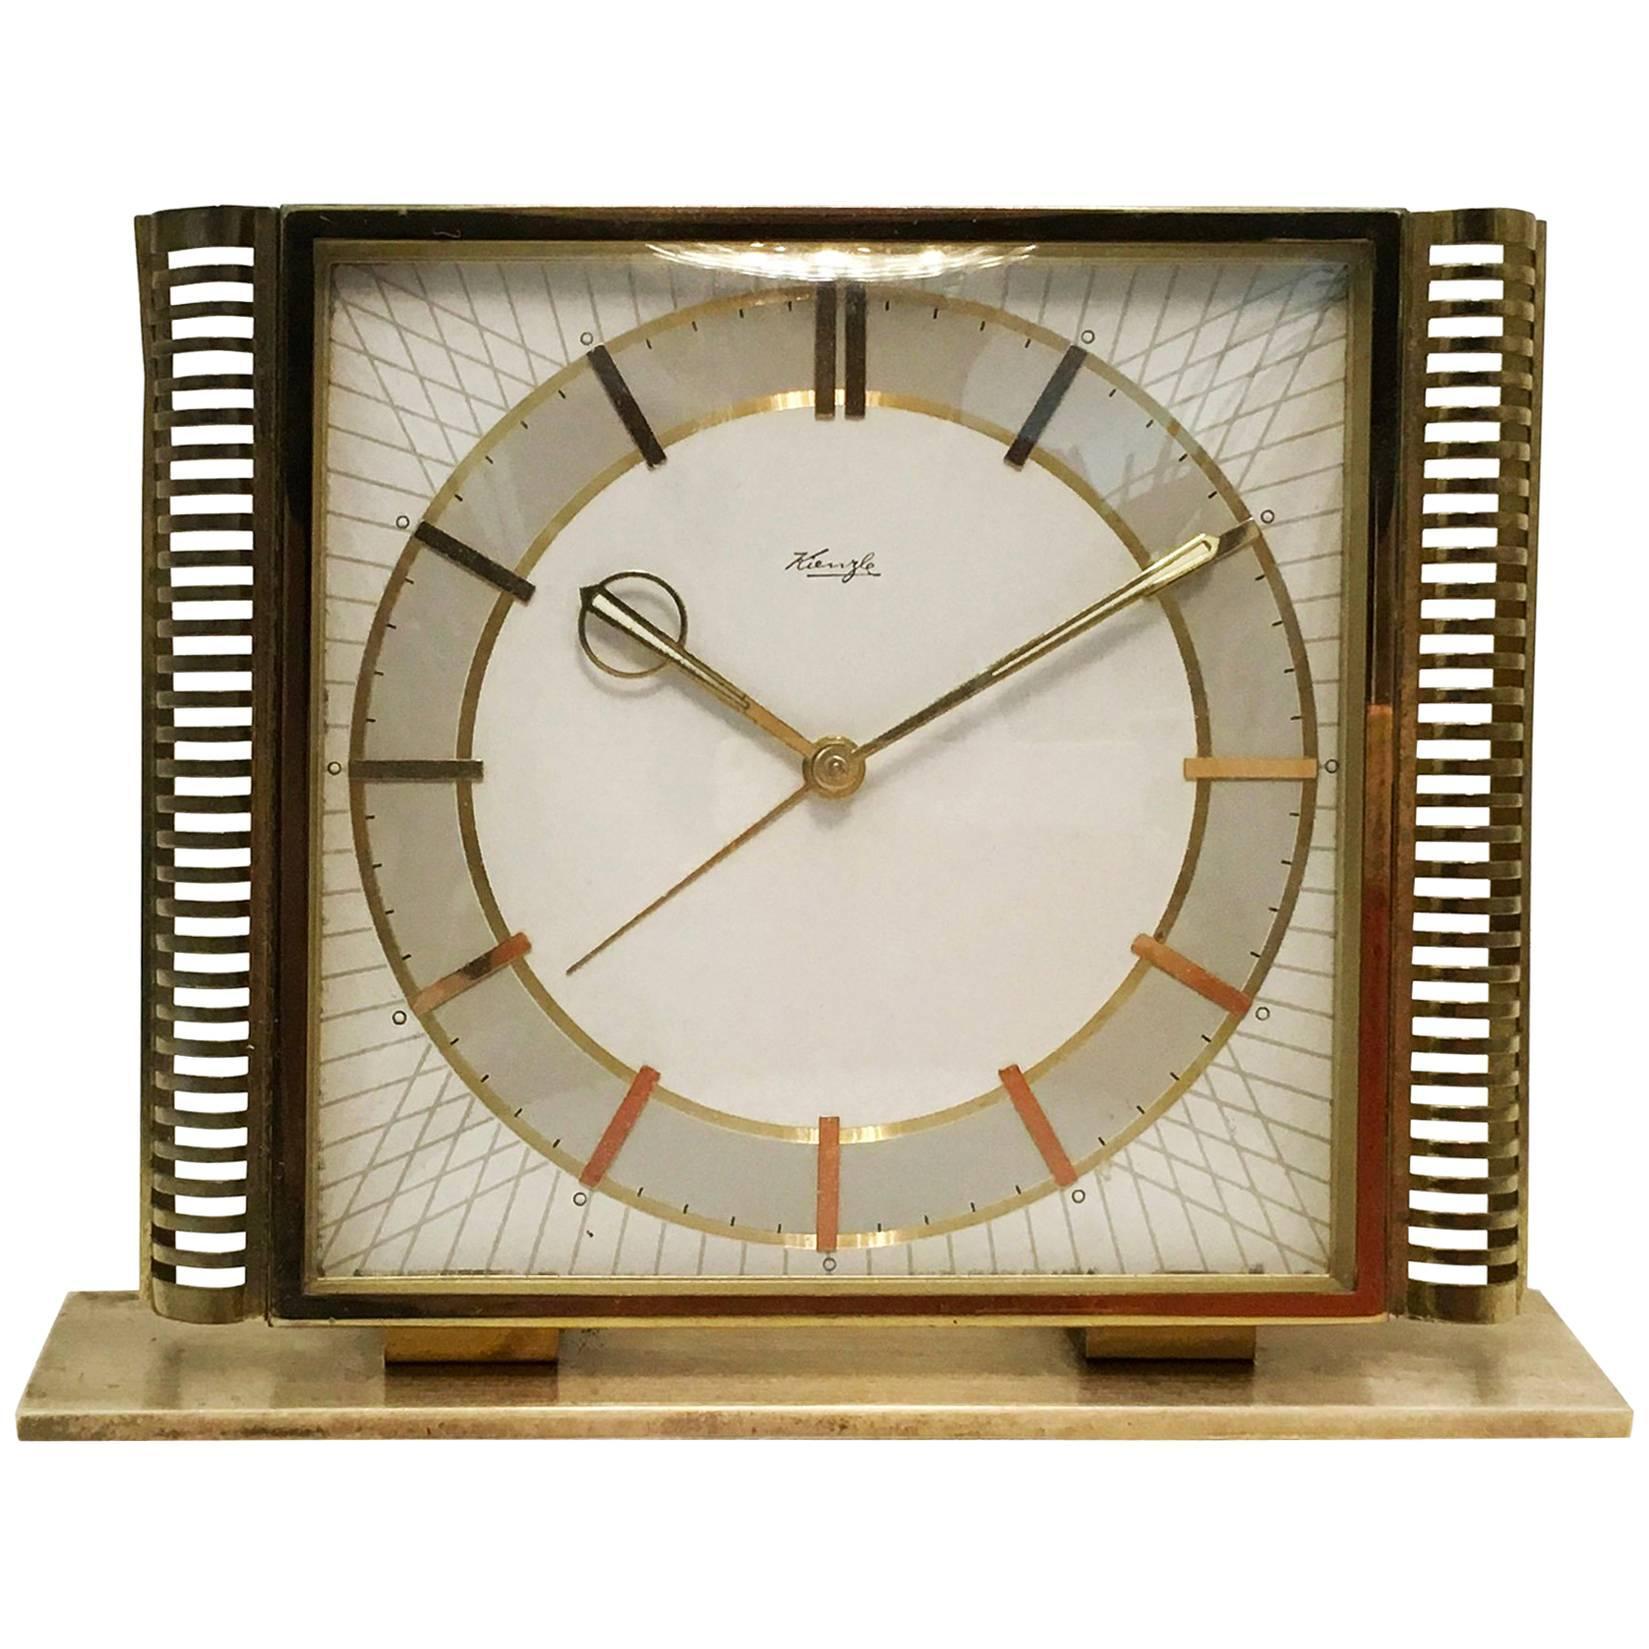 Midcentury Table Clock by Kienzle